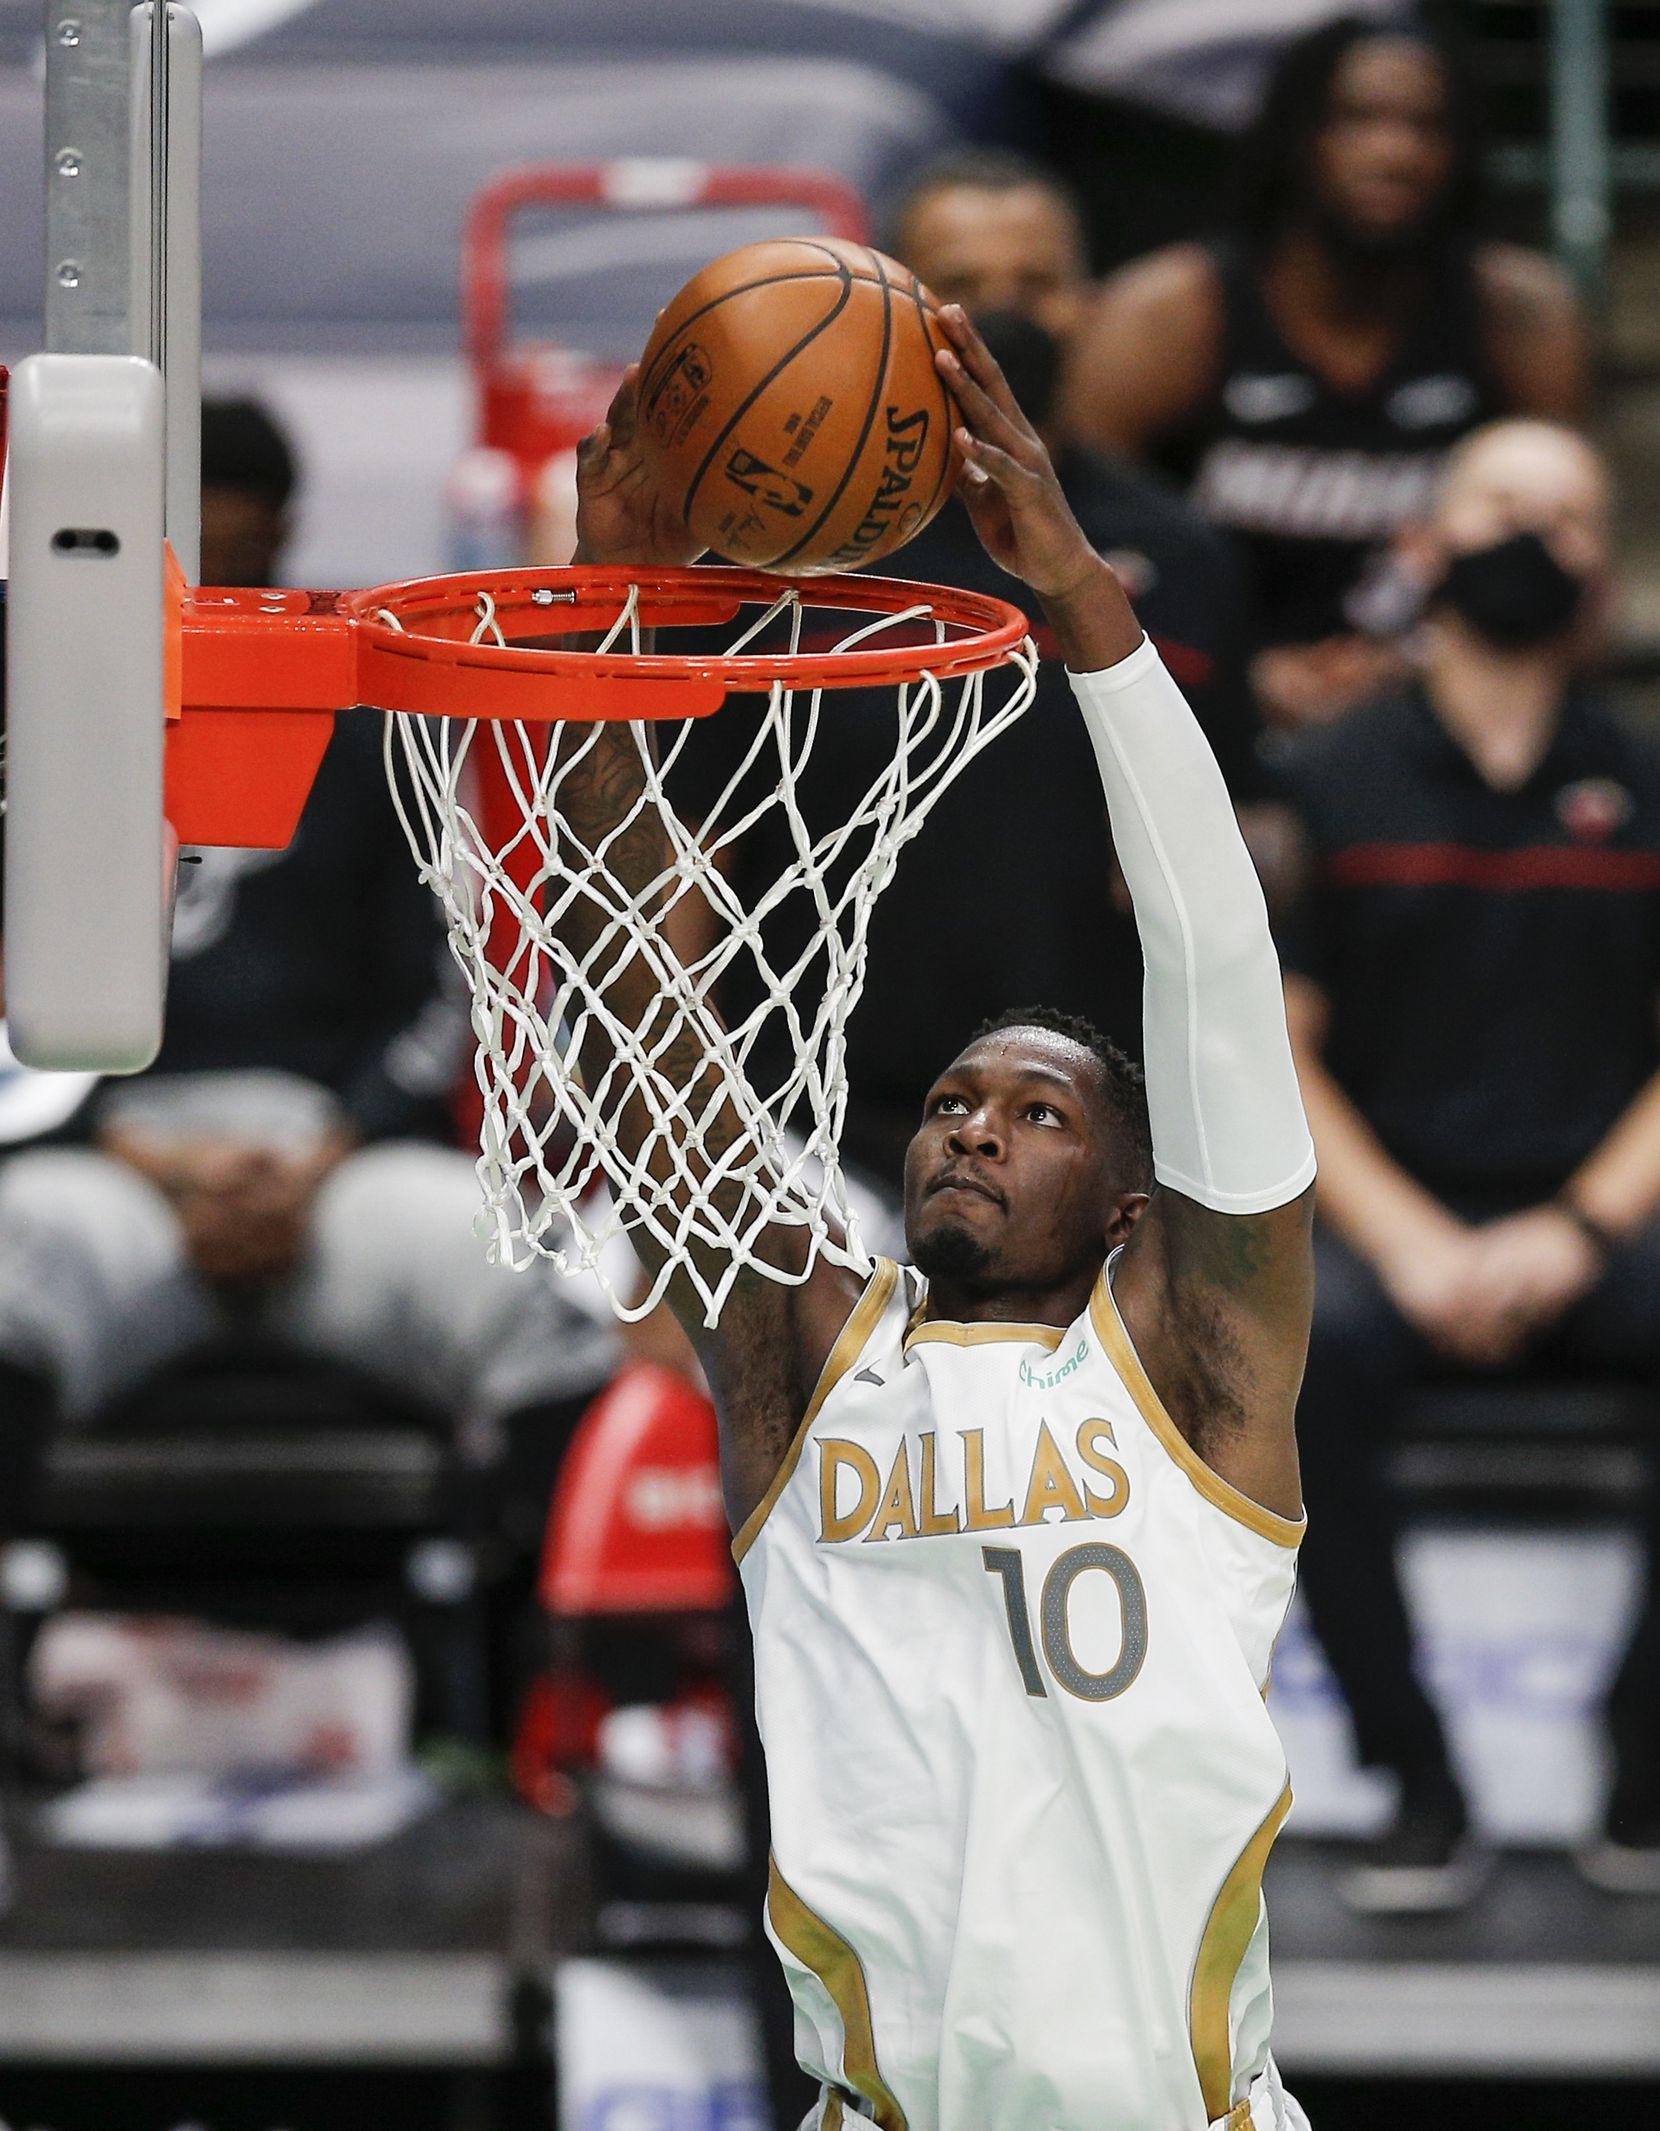 Dallas Mavericks forward Dorian Finney-Smith (10) dunks during the second half of an NBA basketball game against the Miami Heat, Friday, January 1, 2021.  Dallas won 93-83. (Brandon Wade/Special Contributor)